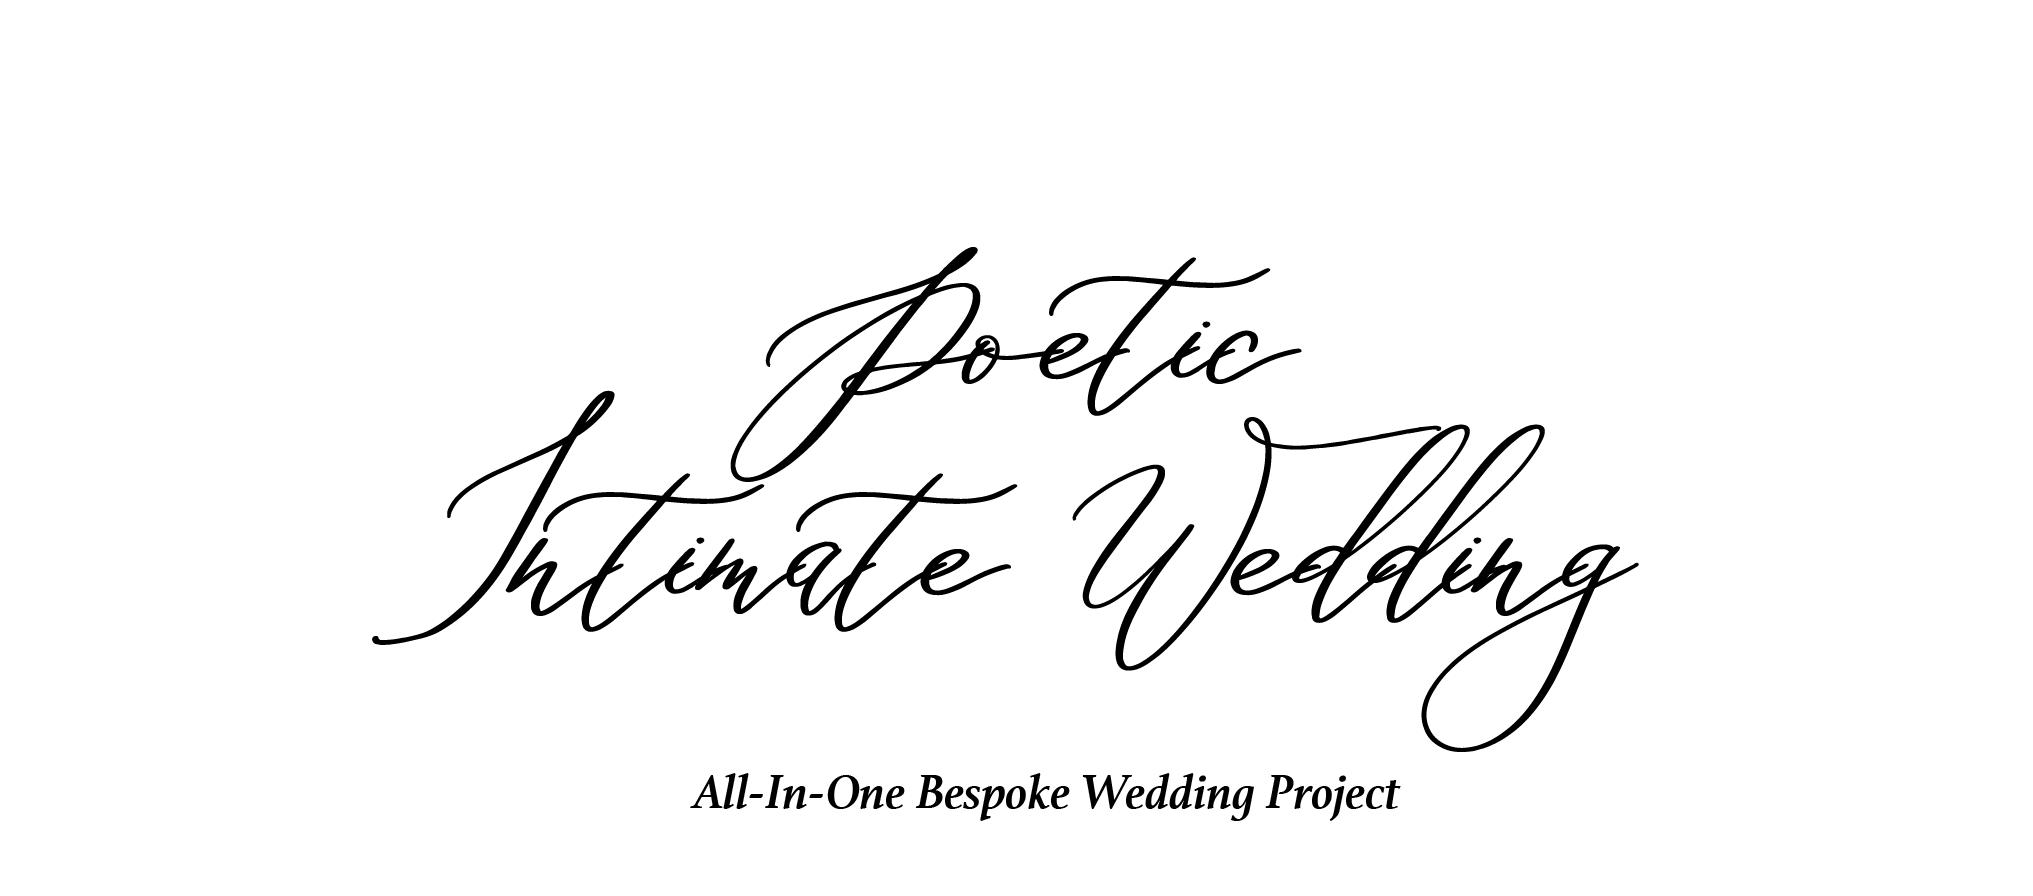 poeticIntimateWedding-01-01.png